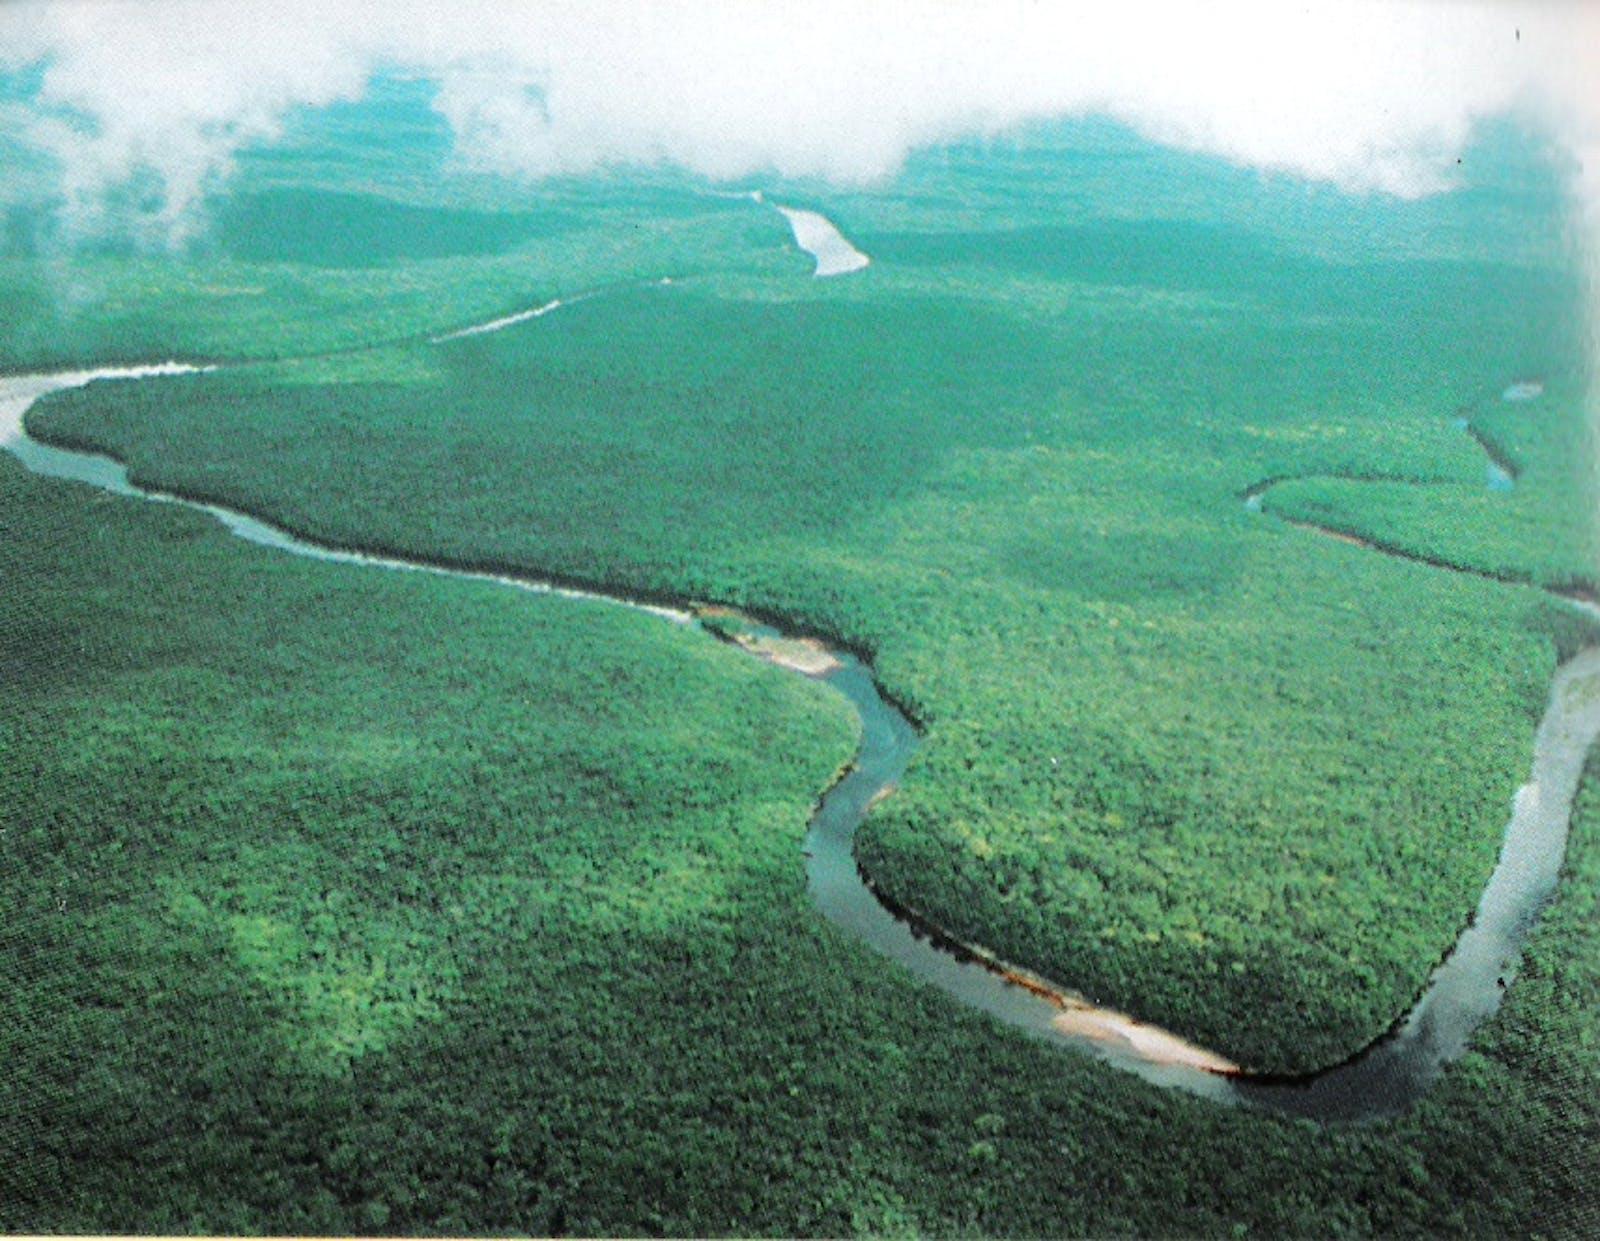 Orinoco Delta Swamp Forests